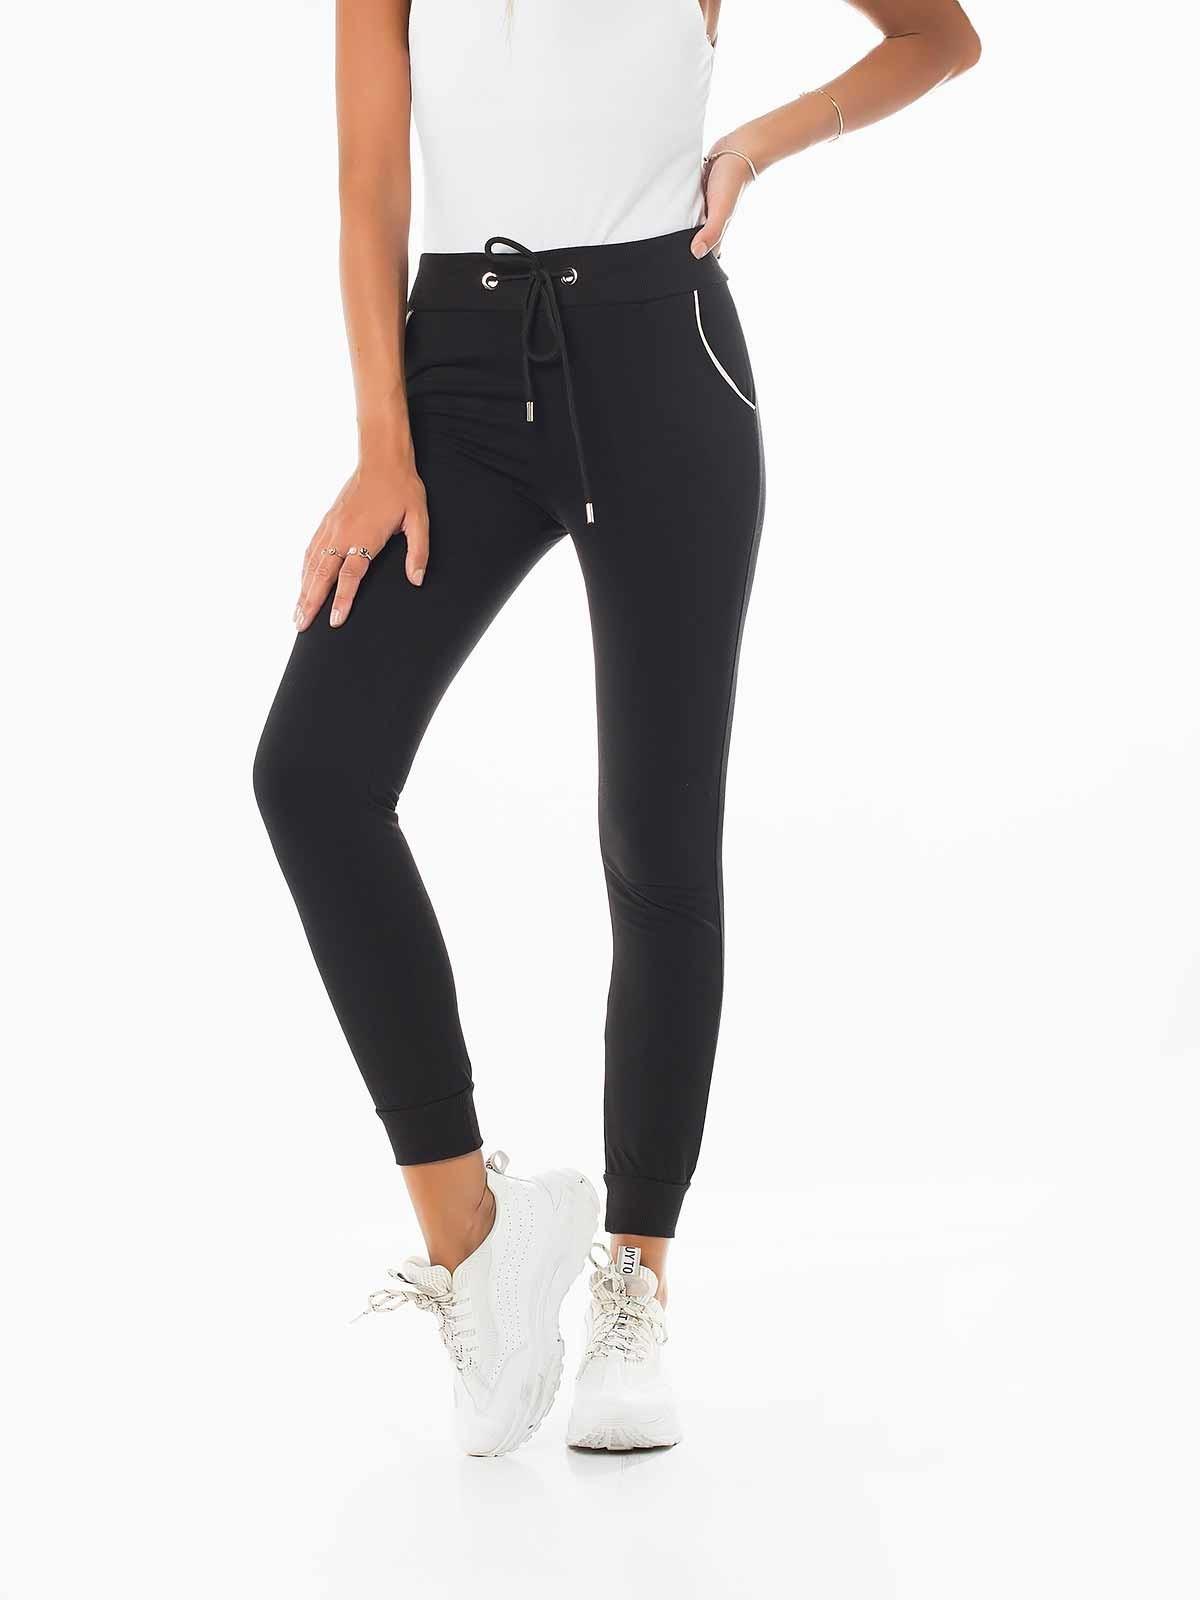 Pantalones de chándal raya blanca